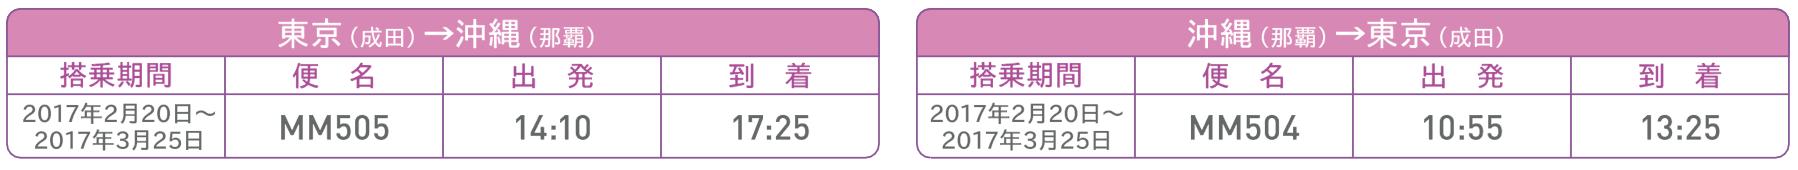 nrtokipea_20170219115809b13.png